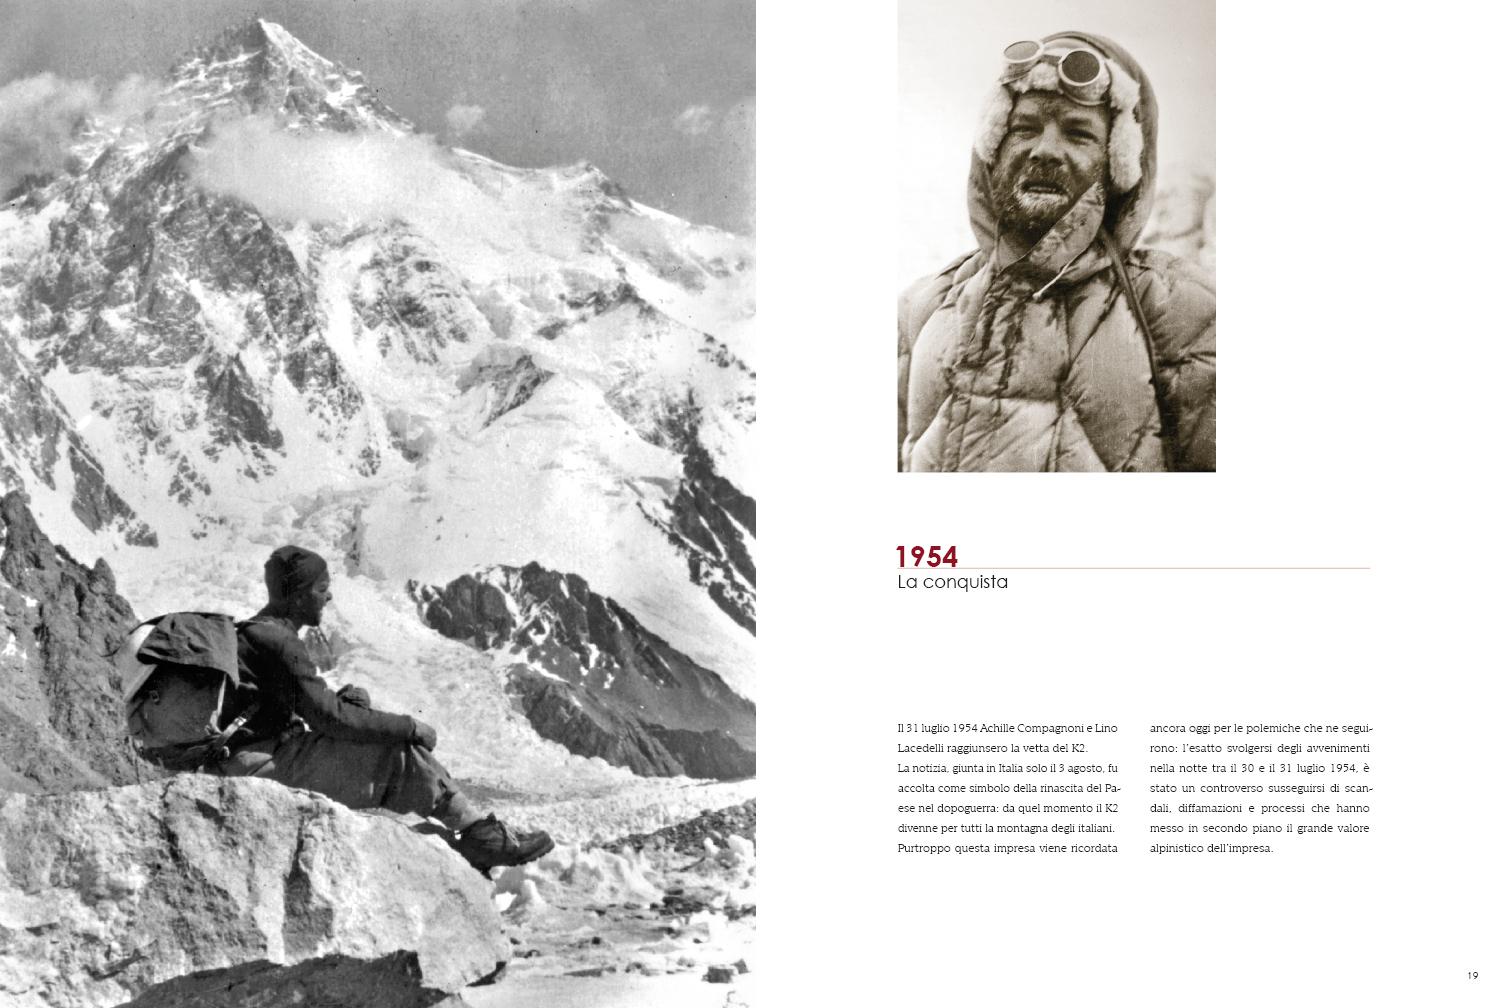 K2 EXPEDITION 1954-2004 Giuseppe Ghedina Fotografo - 011.jpg